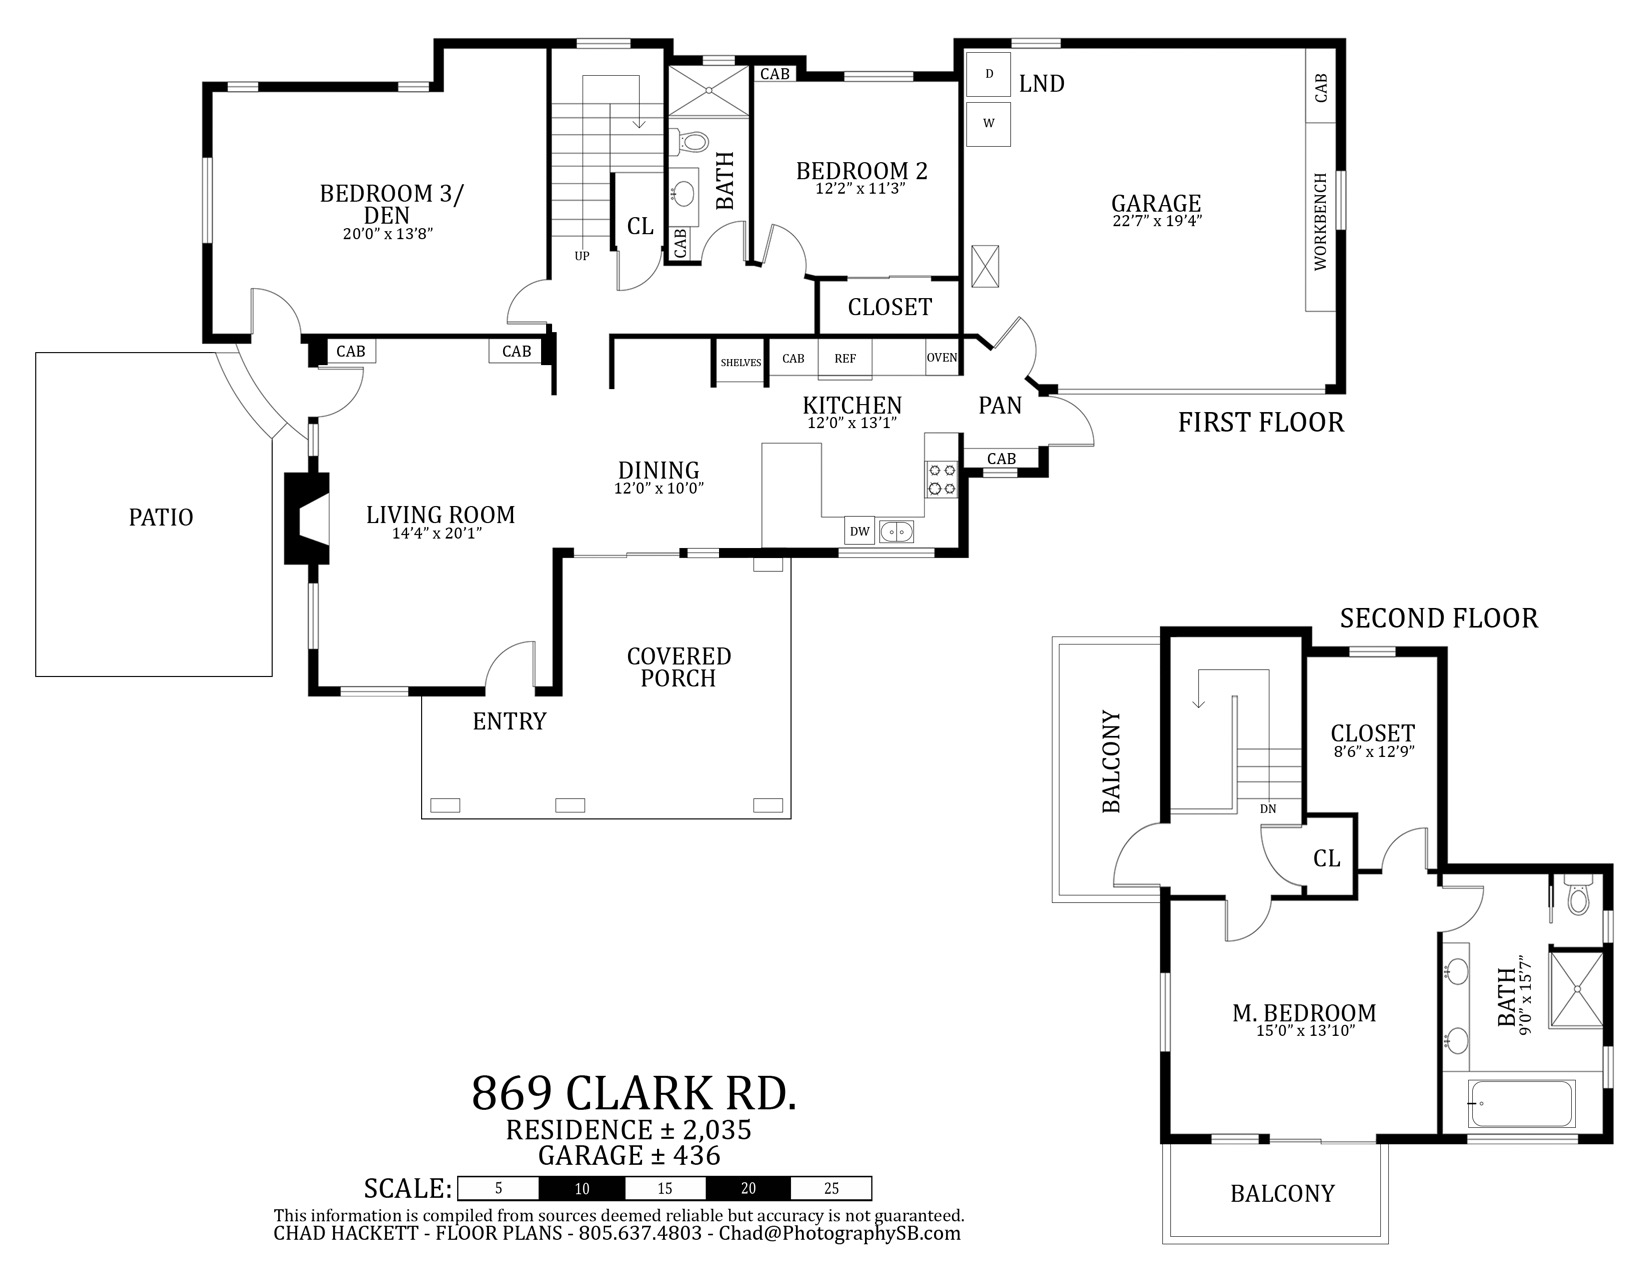 869 Clark Rd. FP.jpg